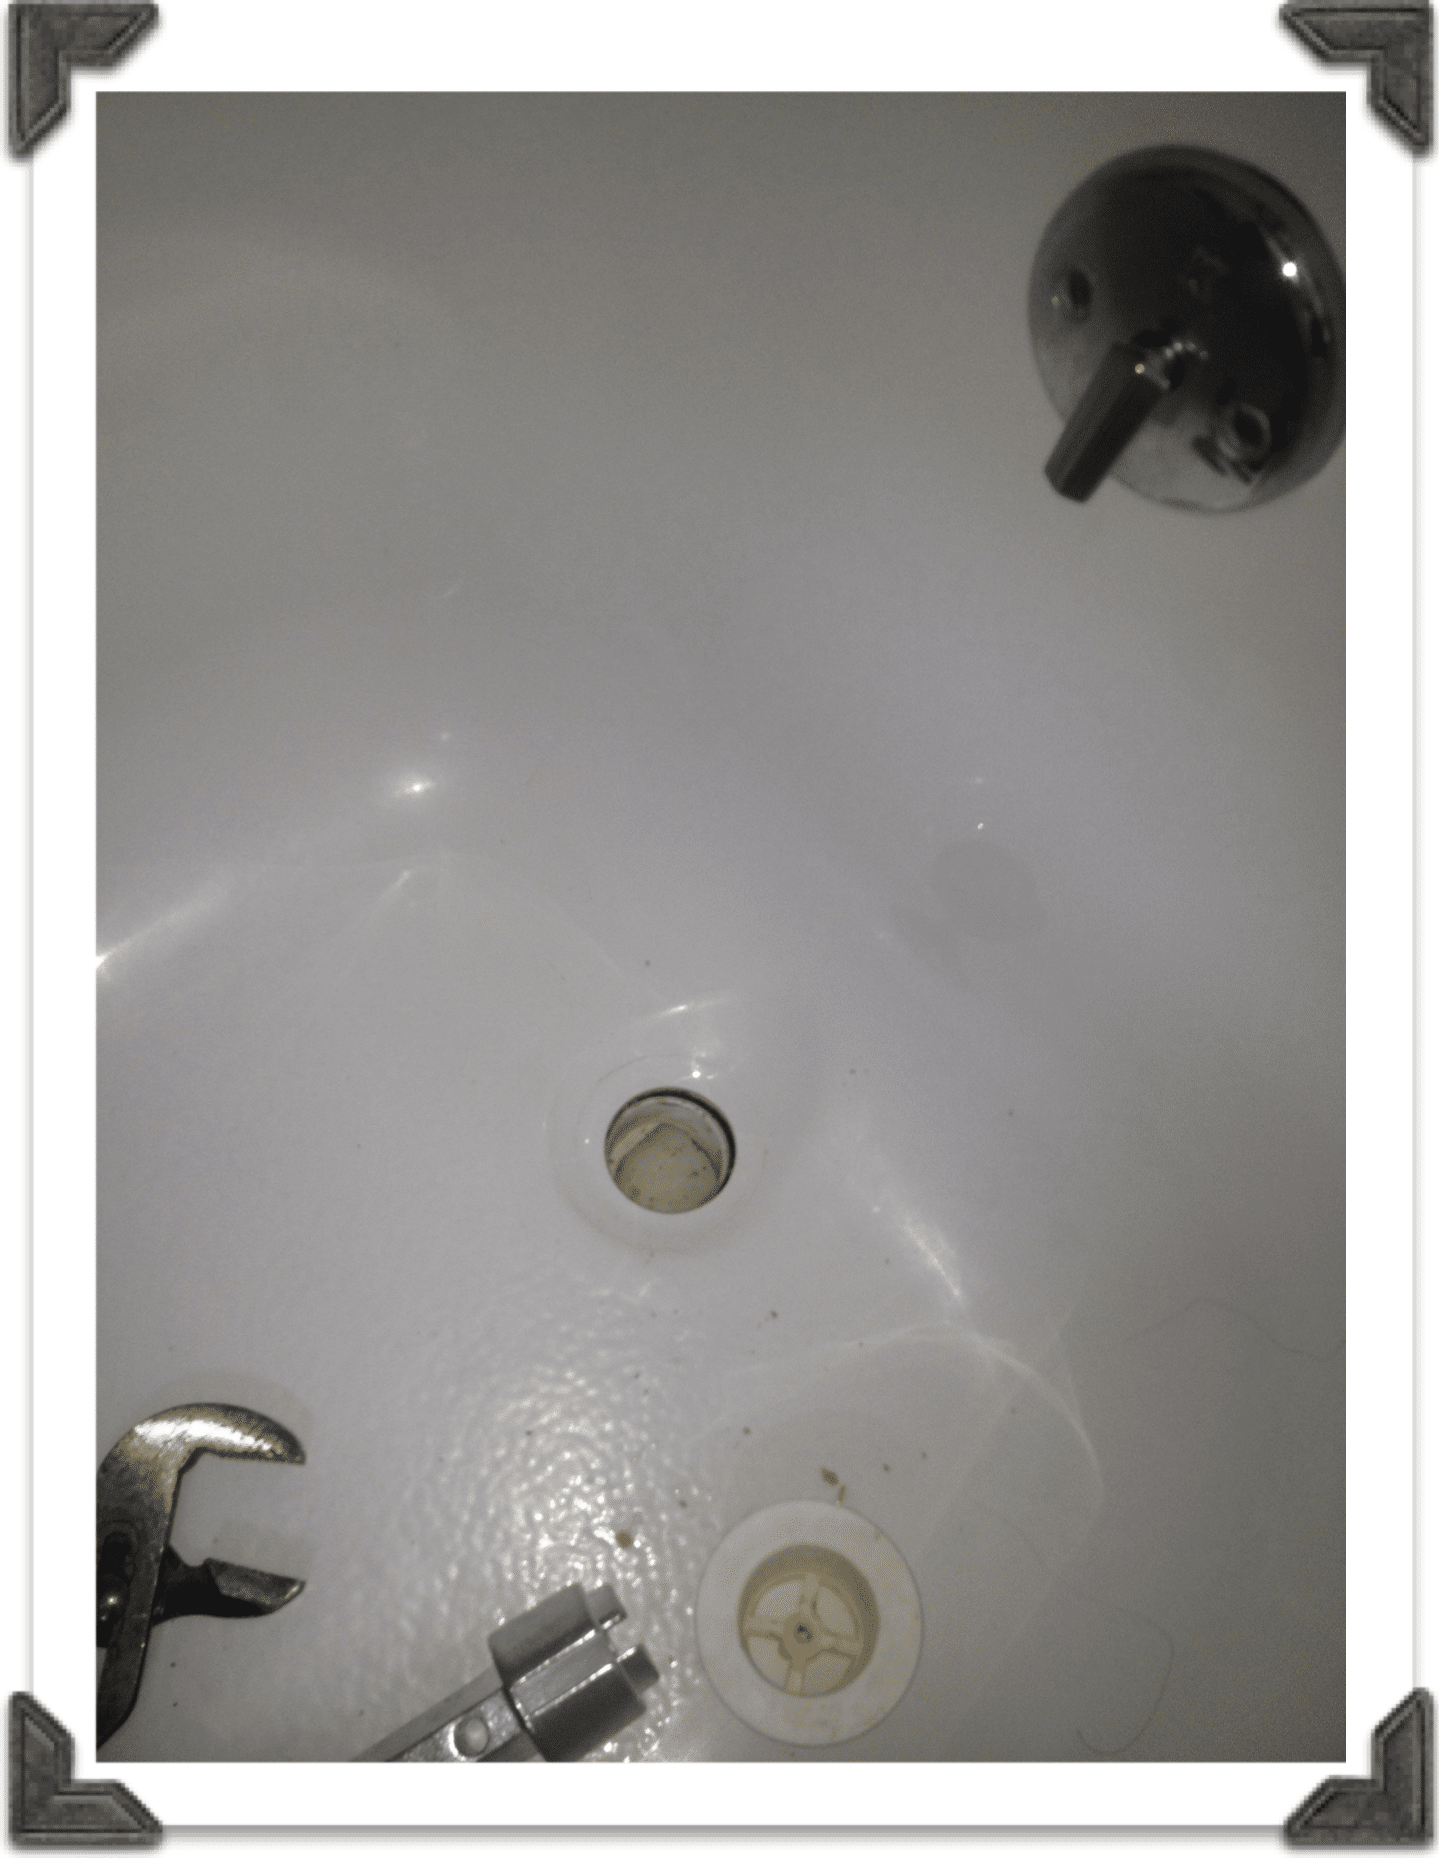 Cleaning Off Plumbers Putty In Bathtub In 2020 Bathtub Drain Drain Repair Bathtub